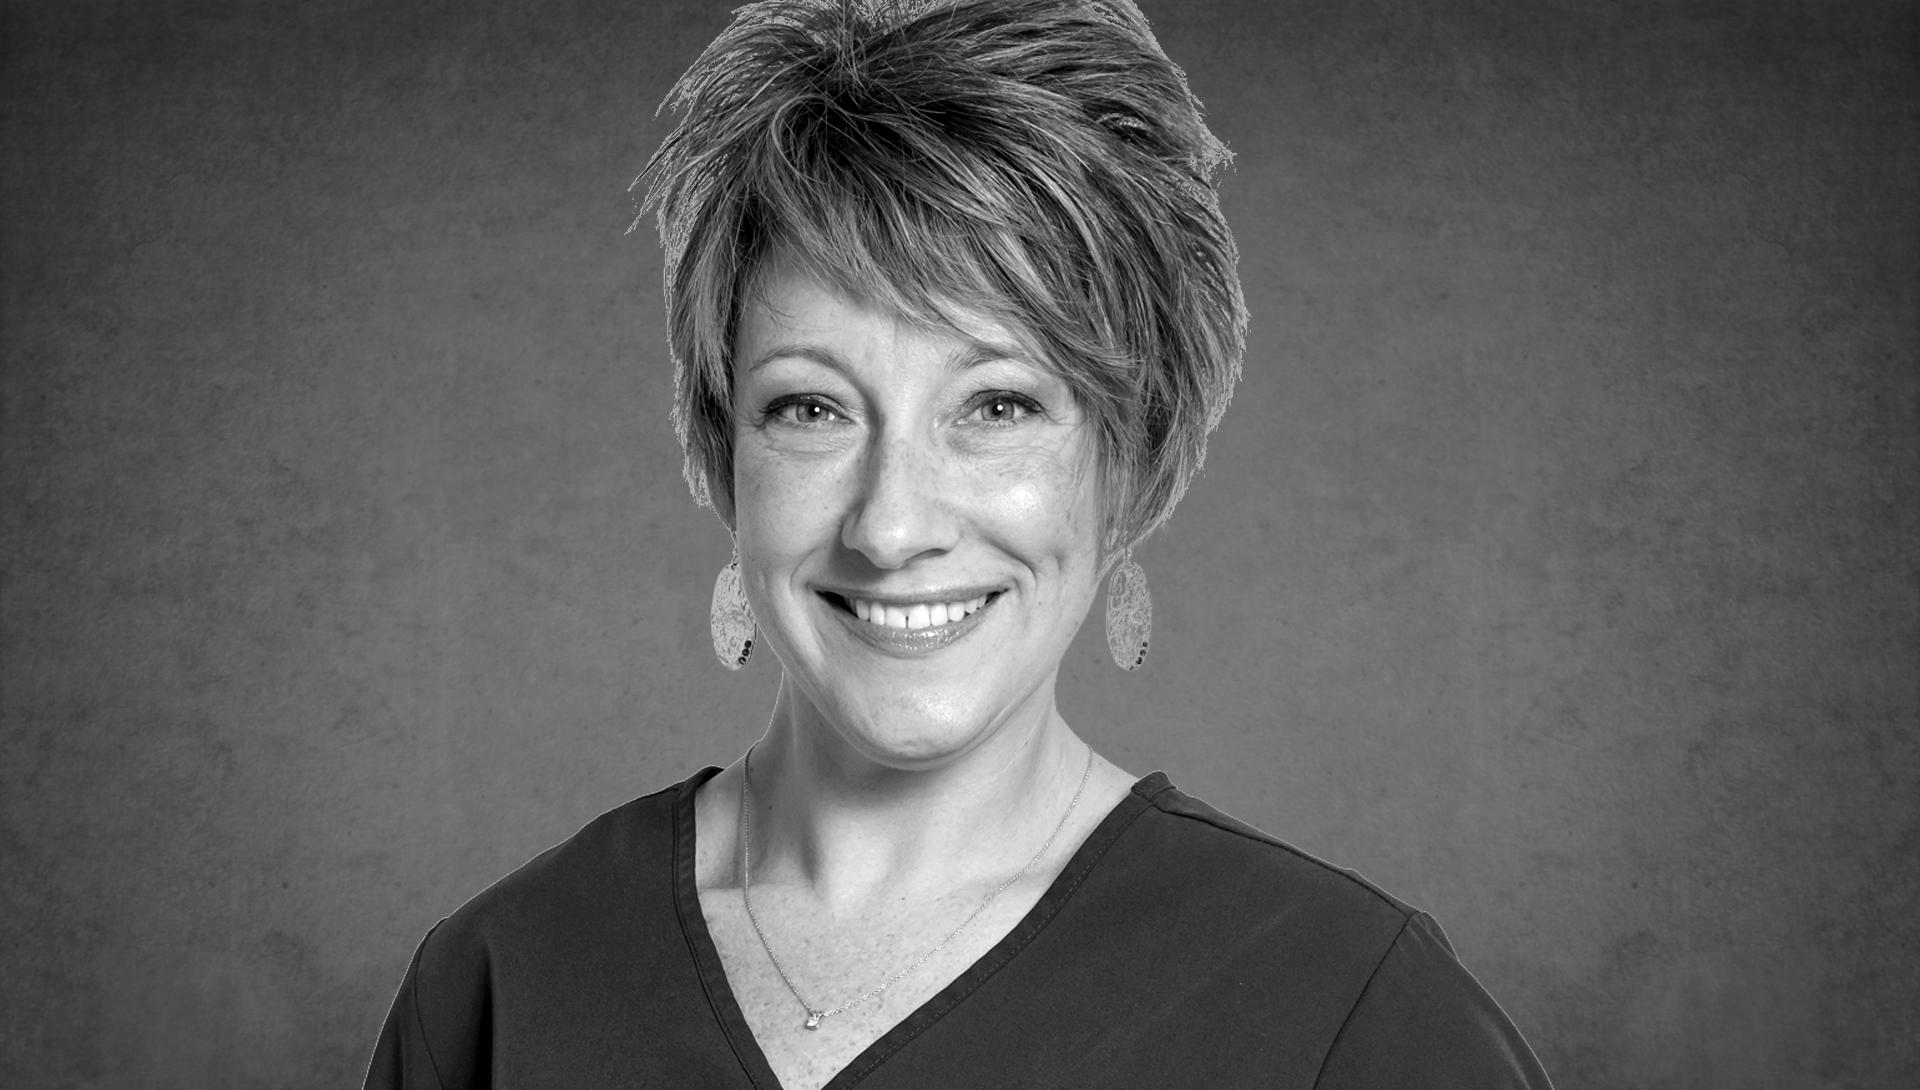 Glaser Dental - Jianna Stetzl, Insurance & Billing Specialist